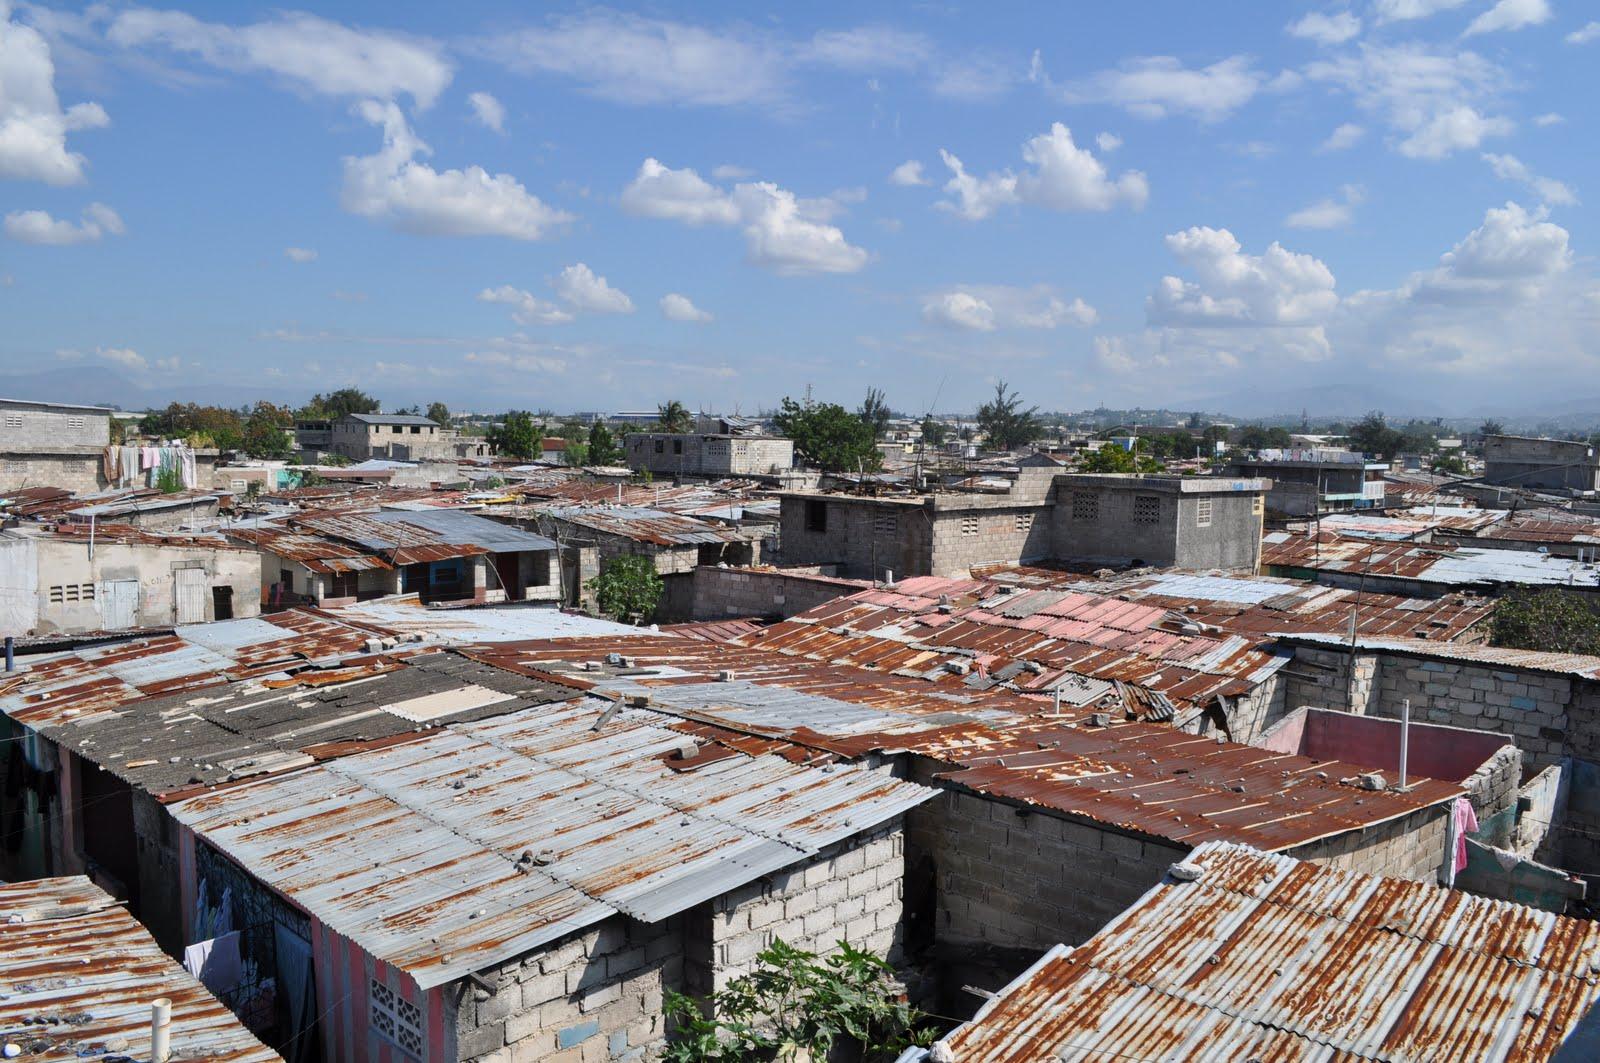 Haitian Hip Hop